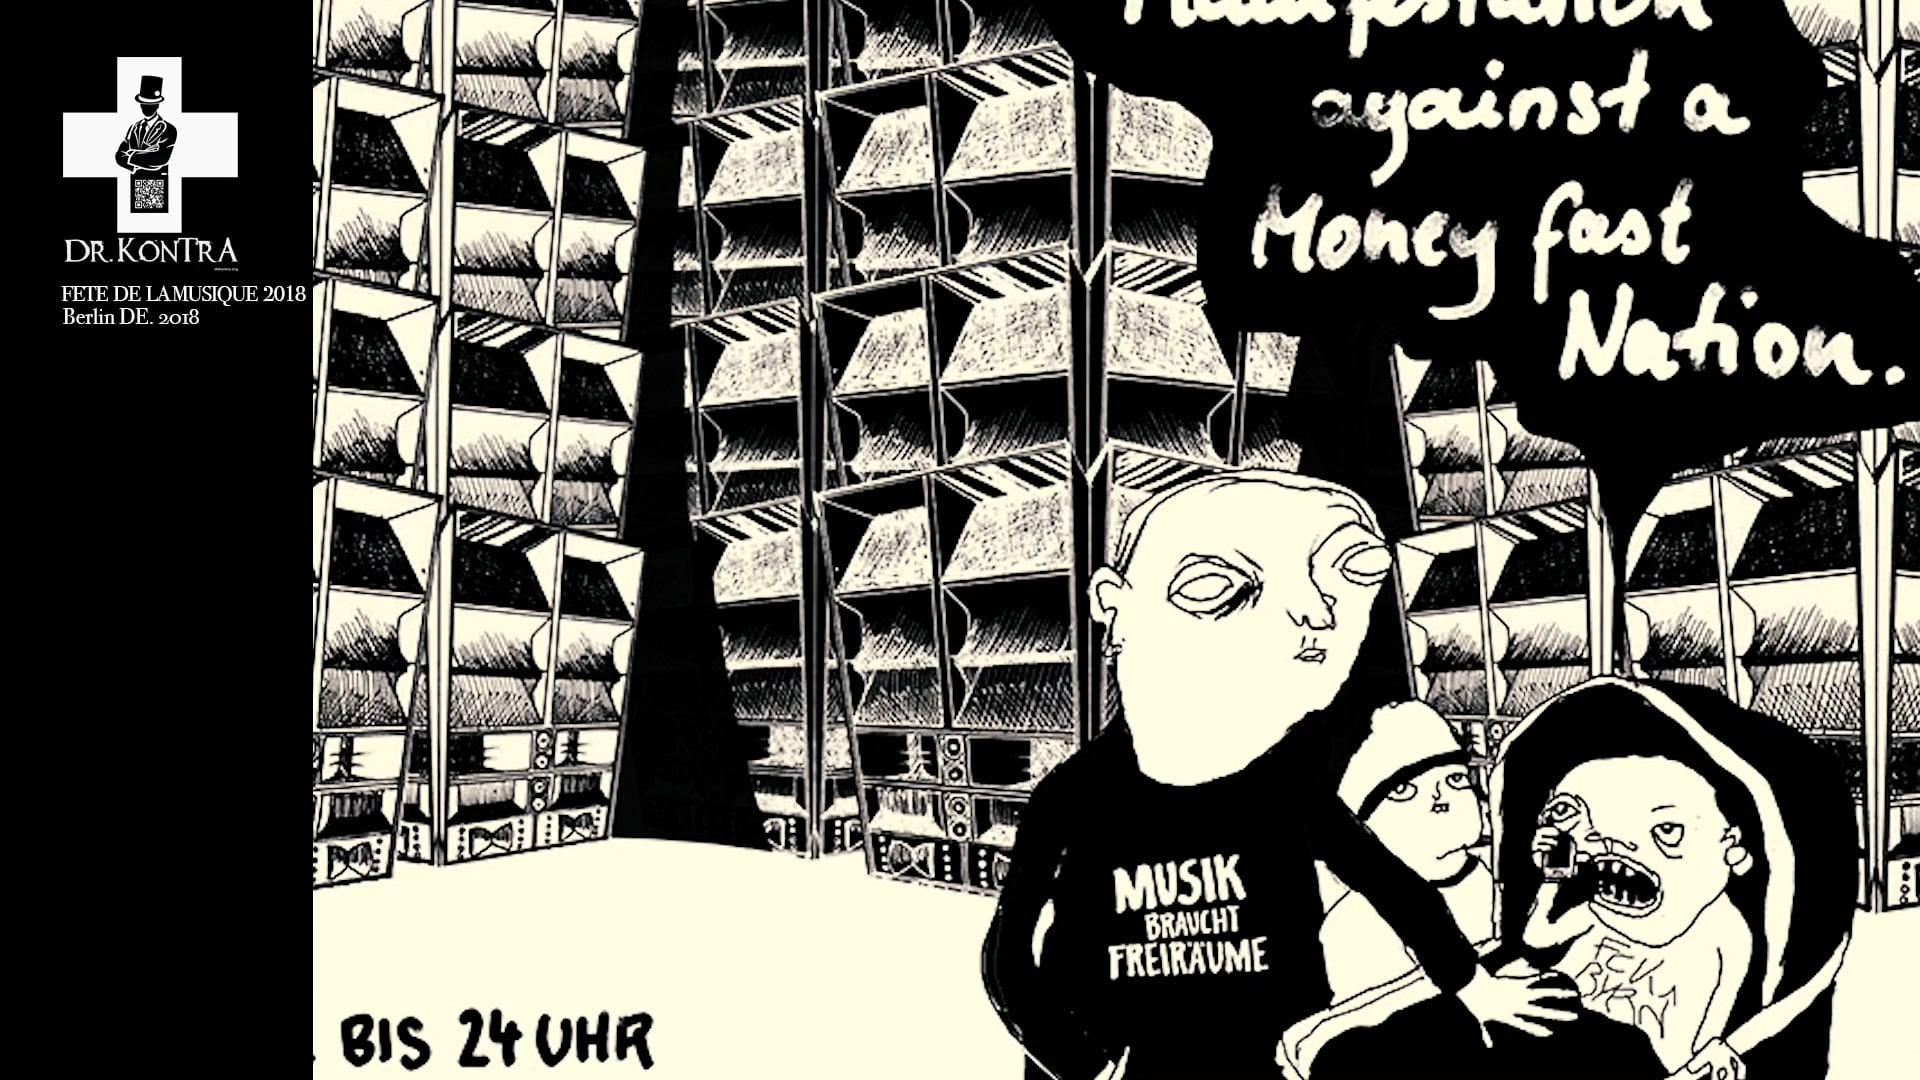 DRKONTRA@ FETE DE LA MUSIQUE 2018 - BERLIN